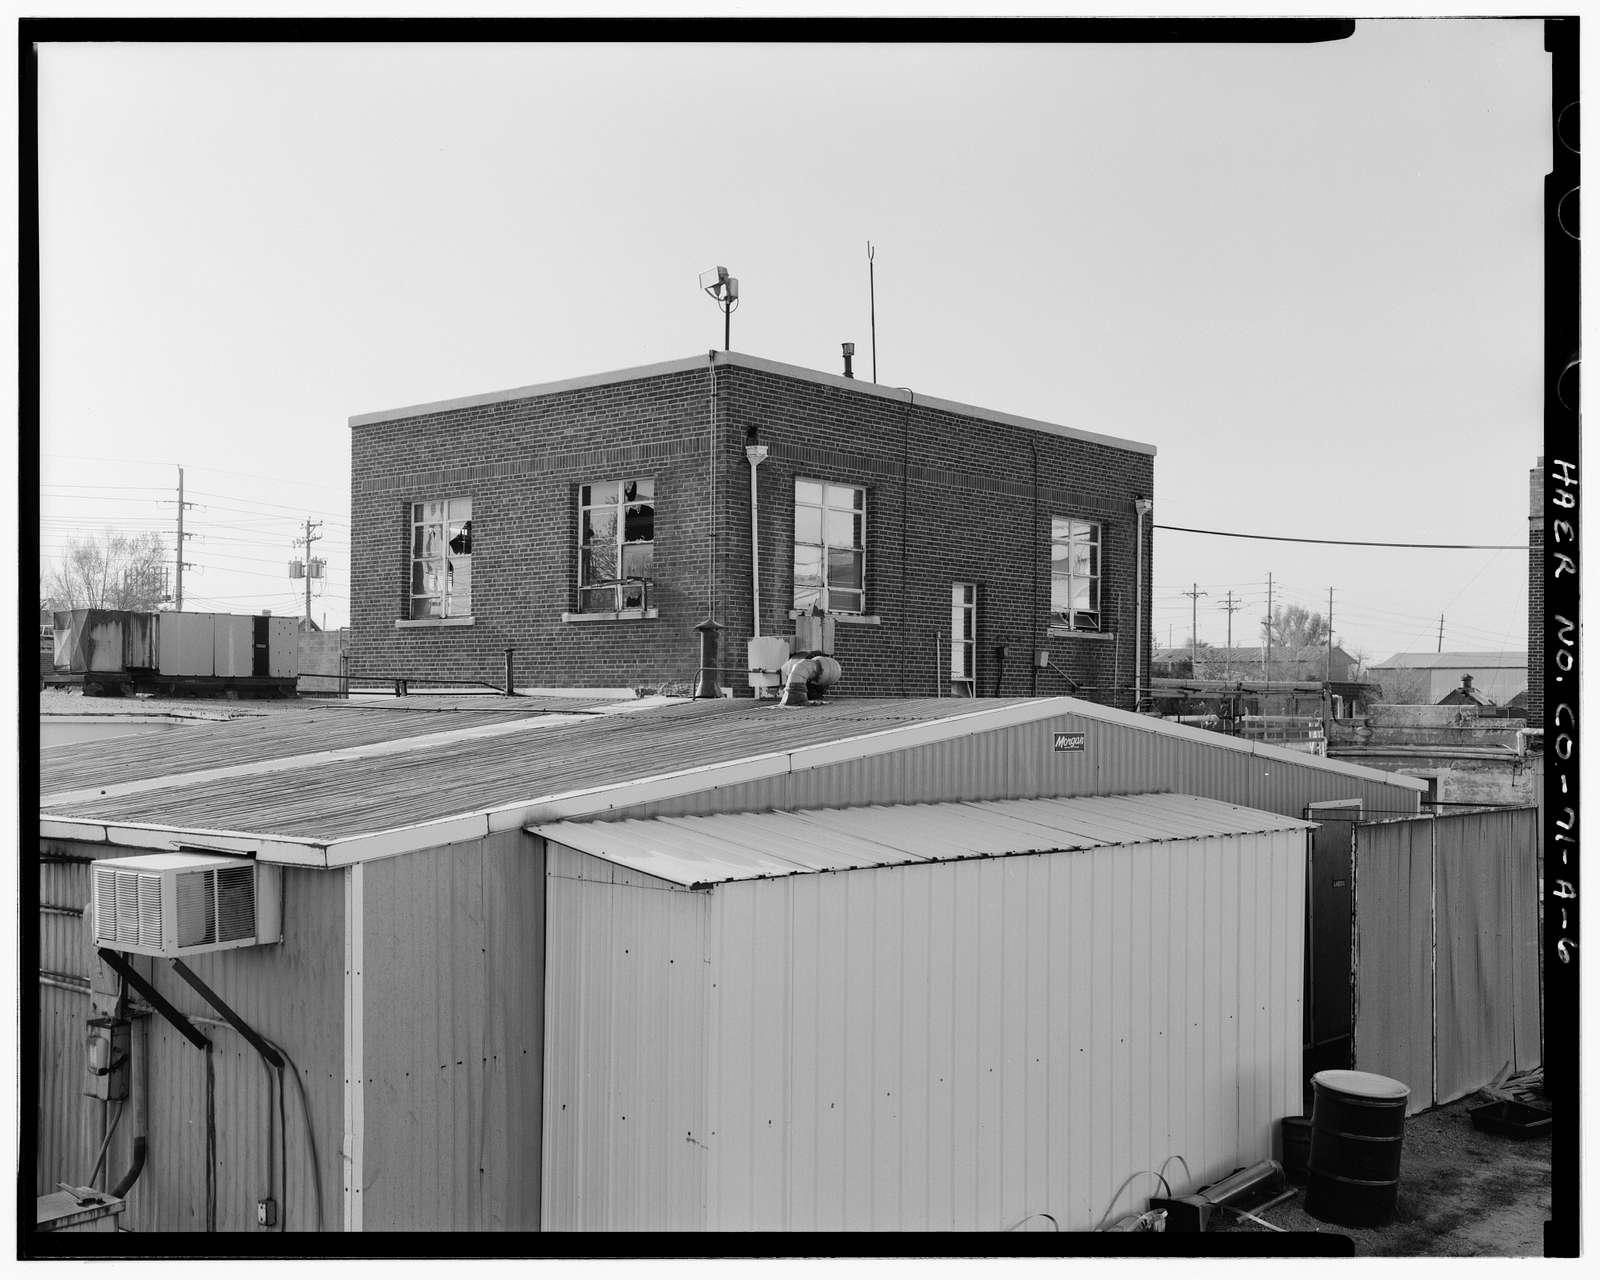 S. W. Shattuck Chemical Company, Incorporated, Building No. 1, 1805 South Bannock Street, Denver, Denver County, CO